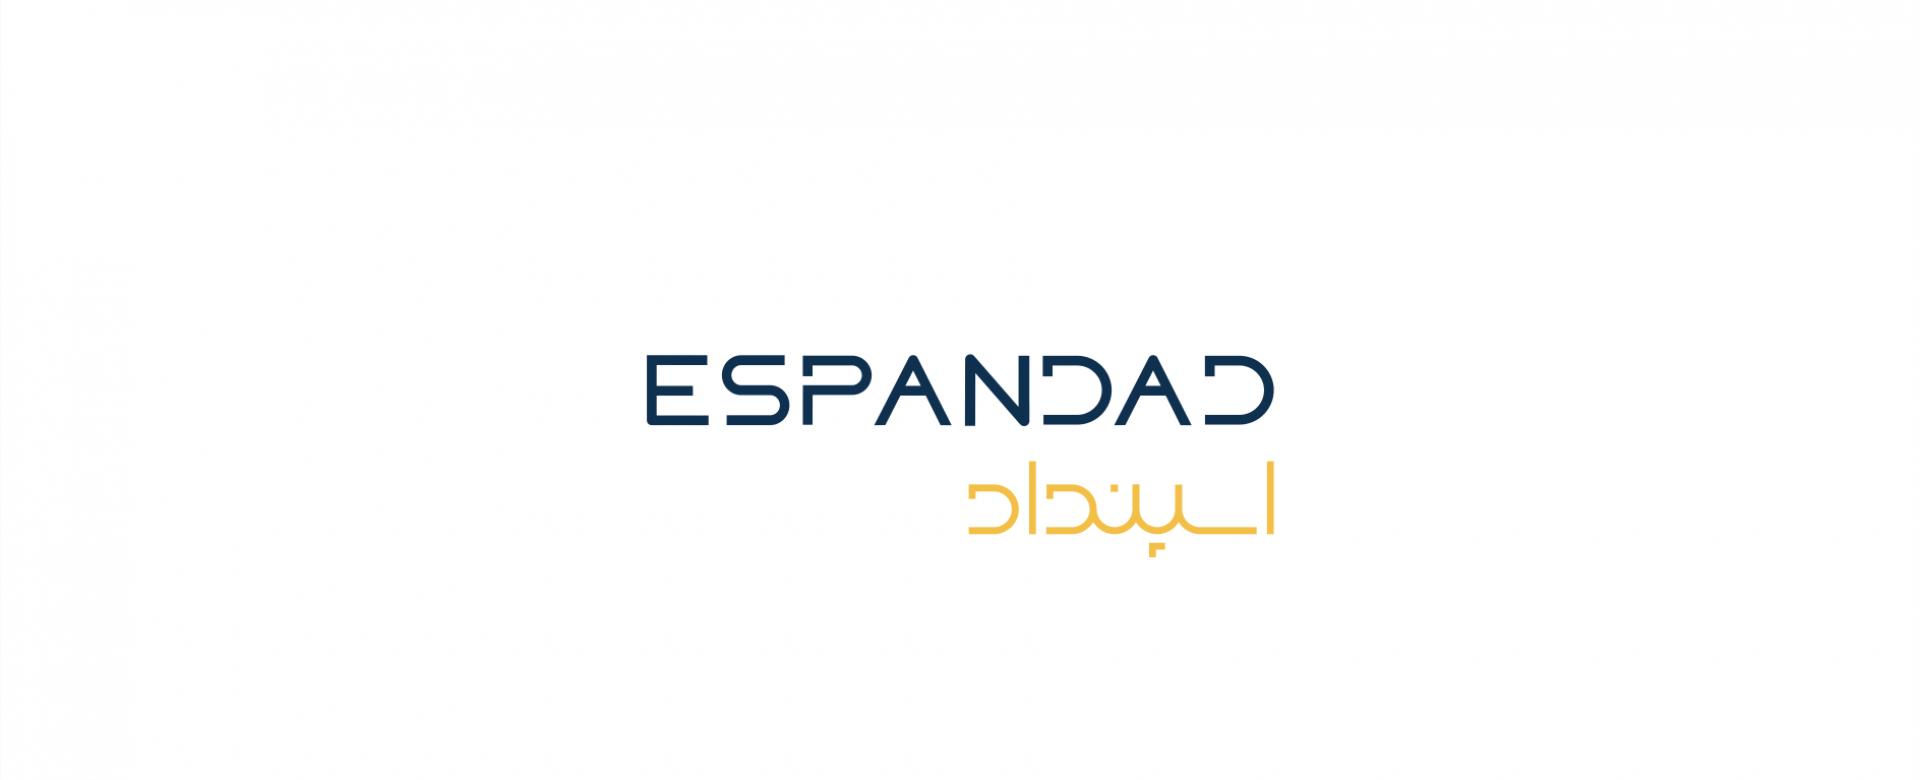 Espandad logo design by ZEN Branding agency طراحی لوگو اسپنداد توسط آژانس برندسازی ذن (15)